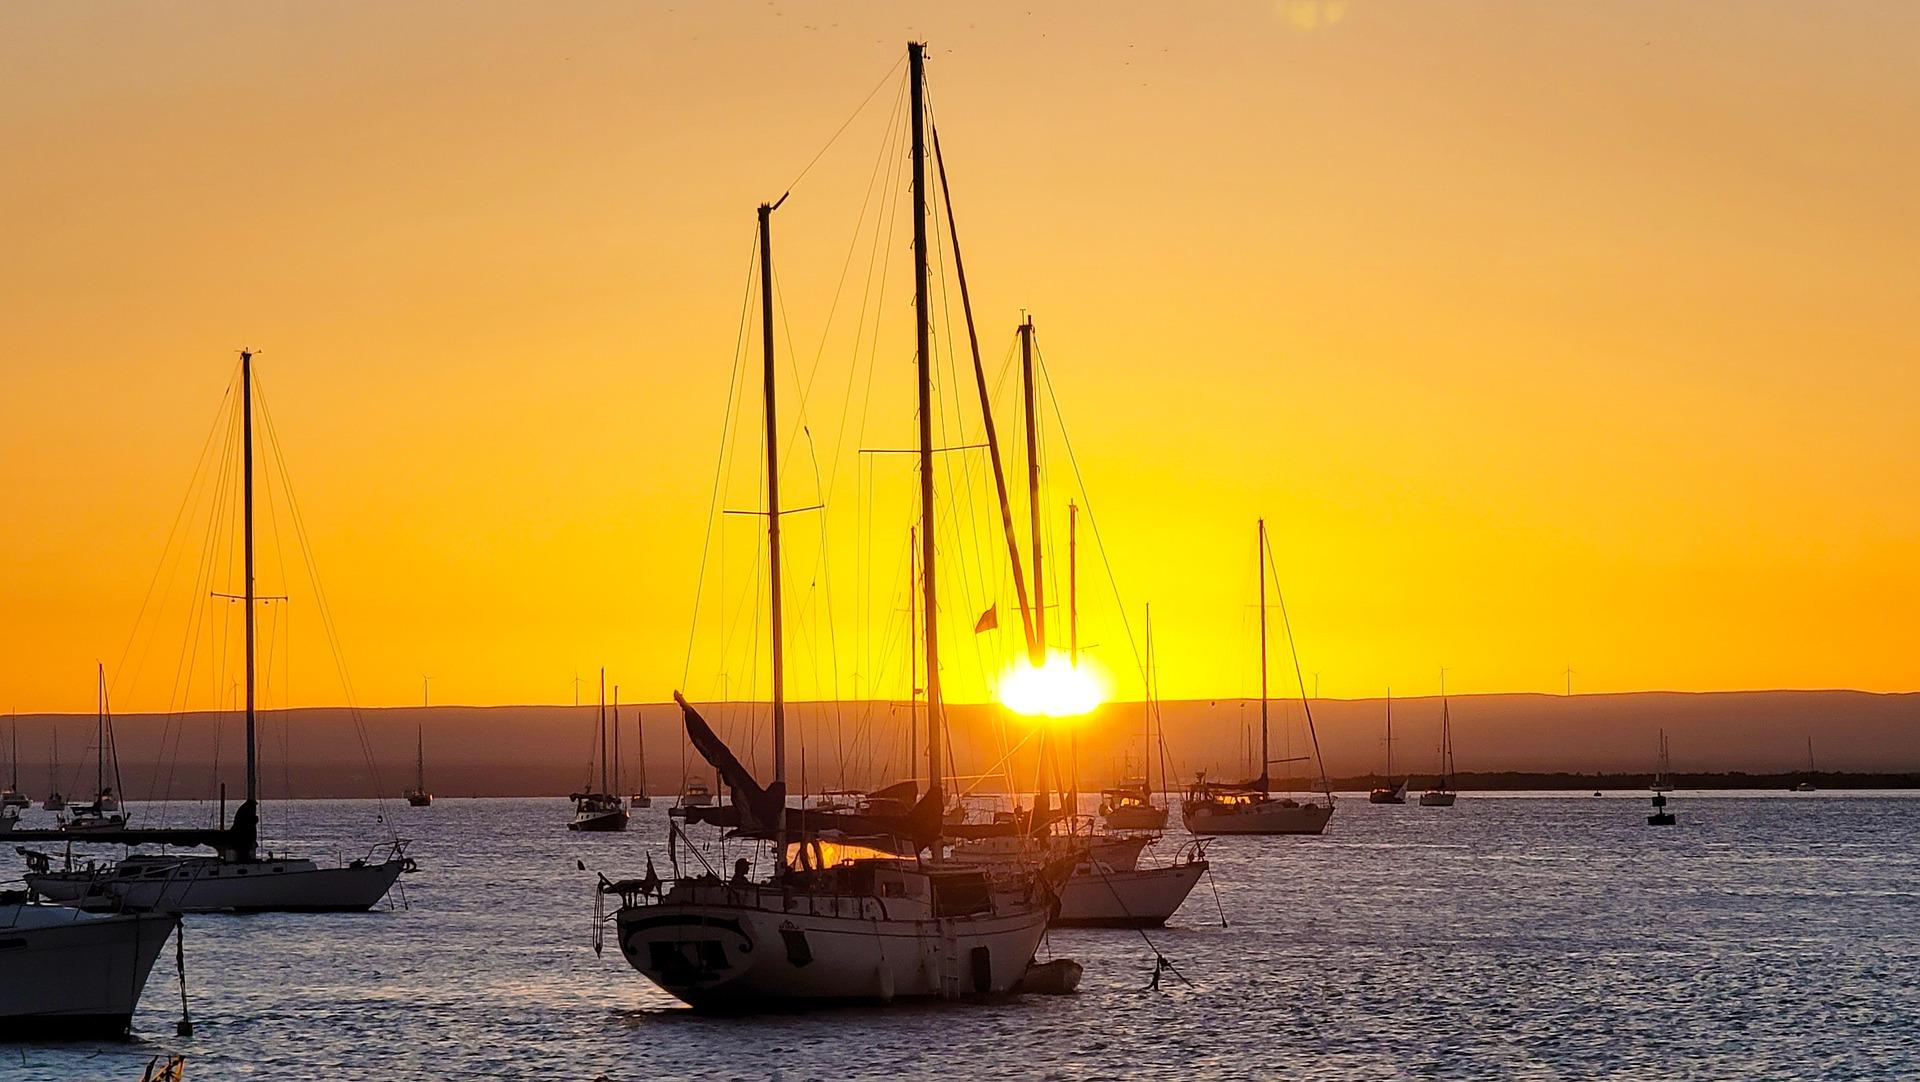 sunset-6026571_1920